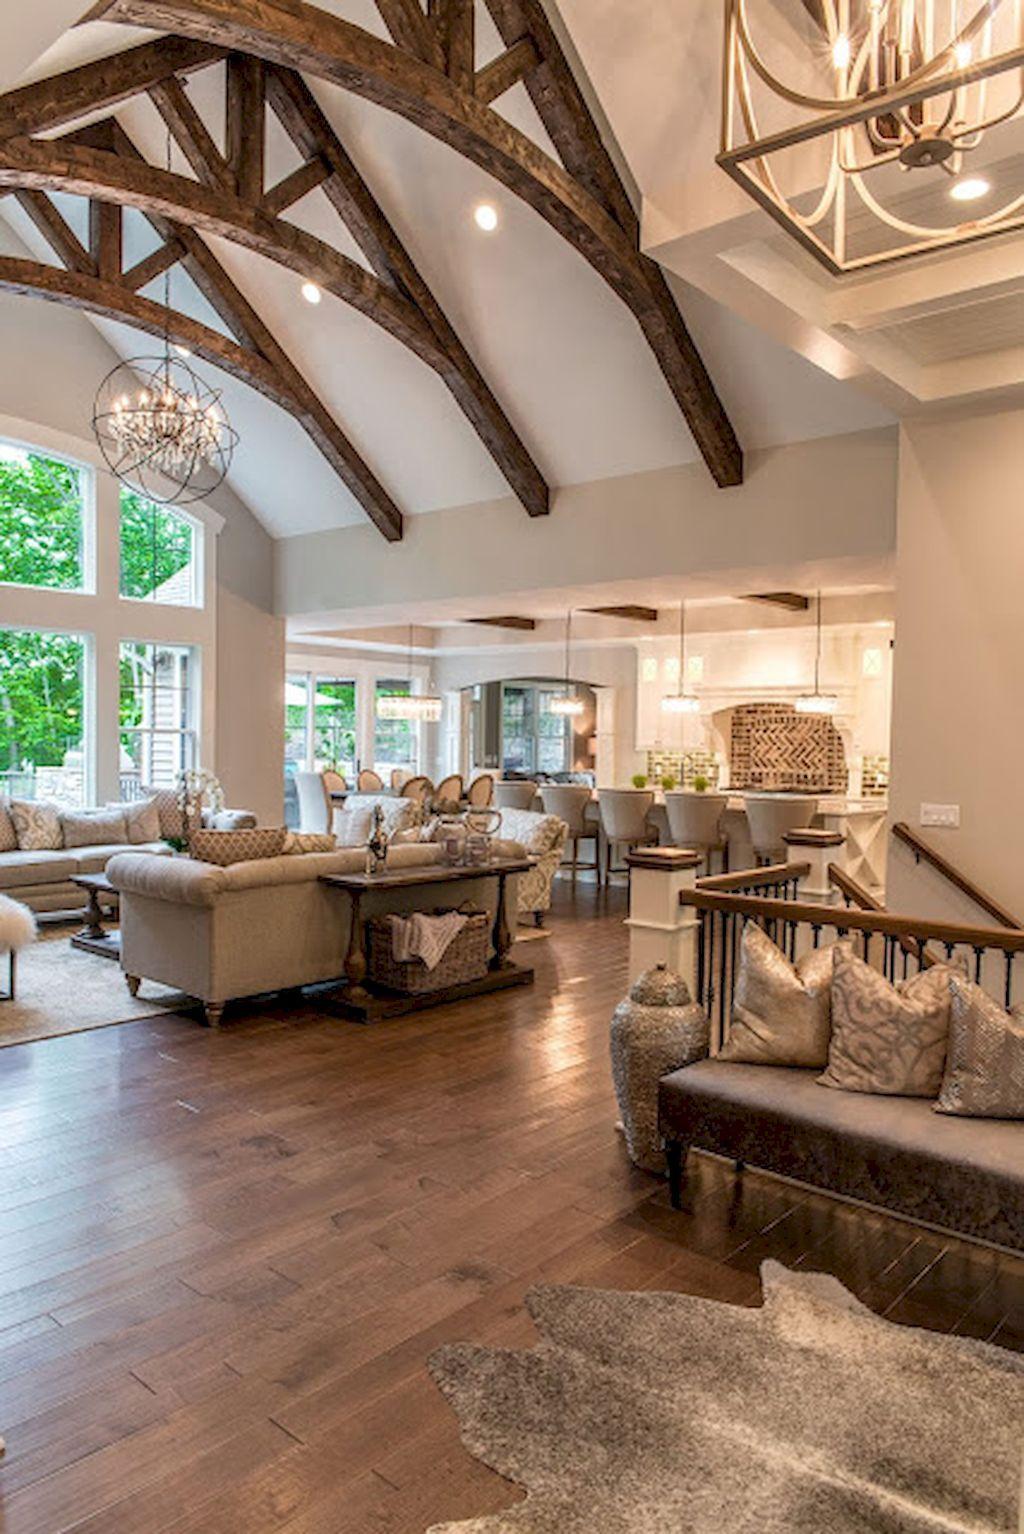 Nice 75 Warm And Cozy Farmhouse Style Living Room Decor Ideas Homeastern